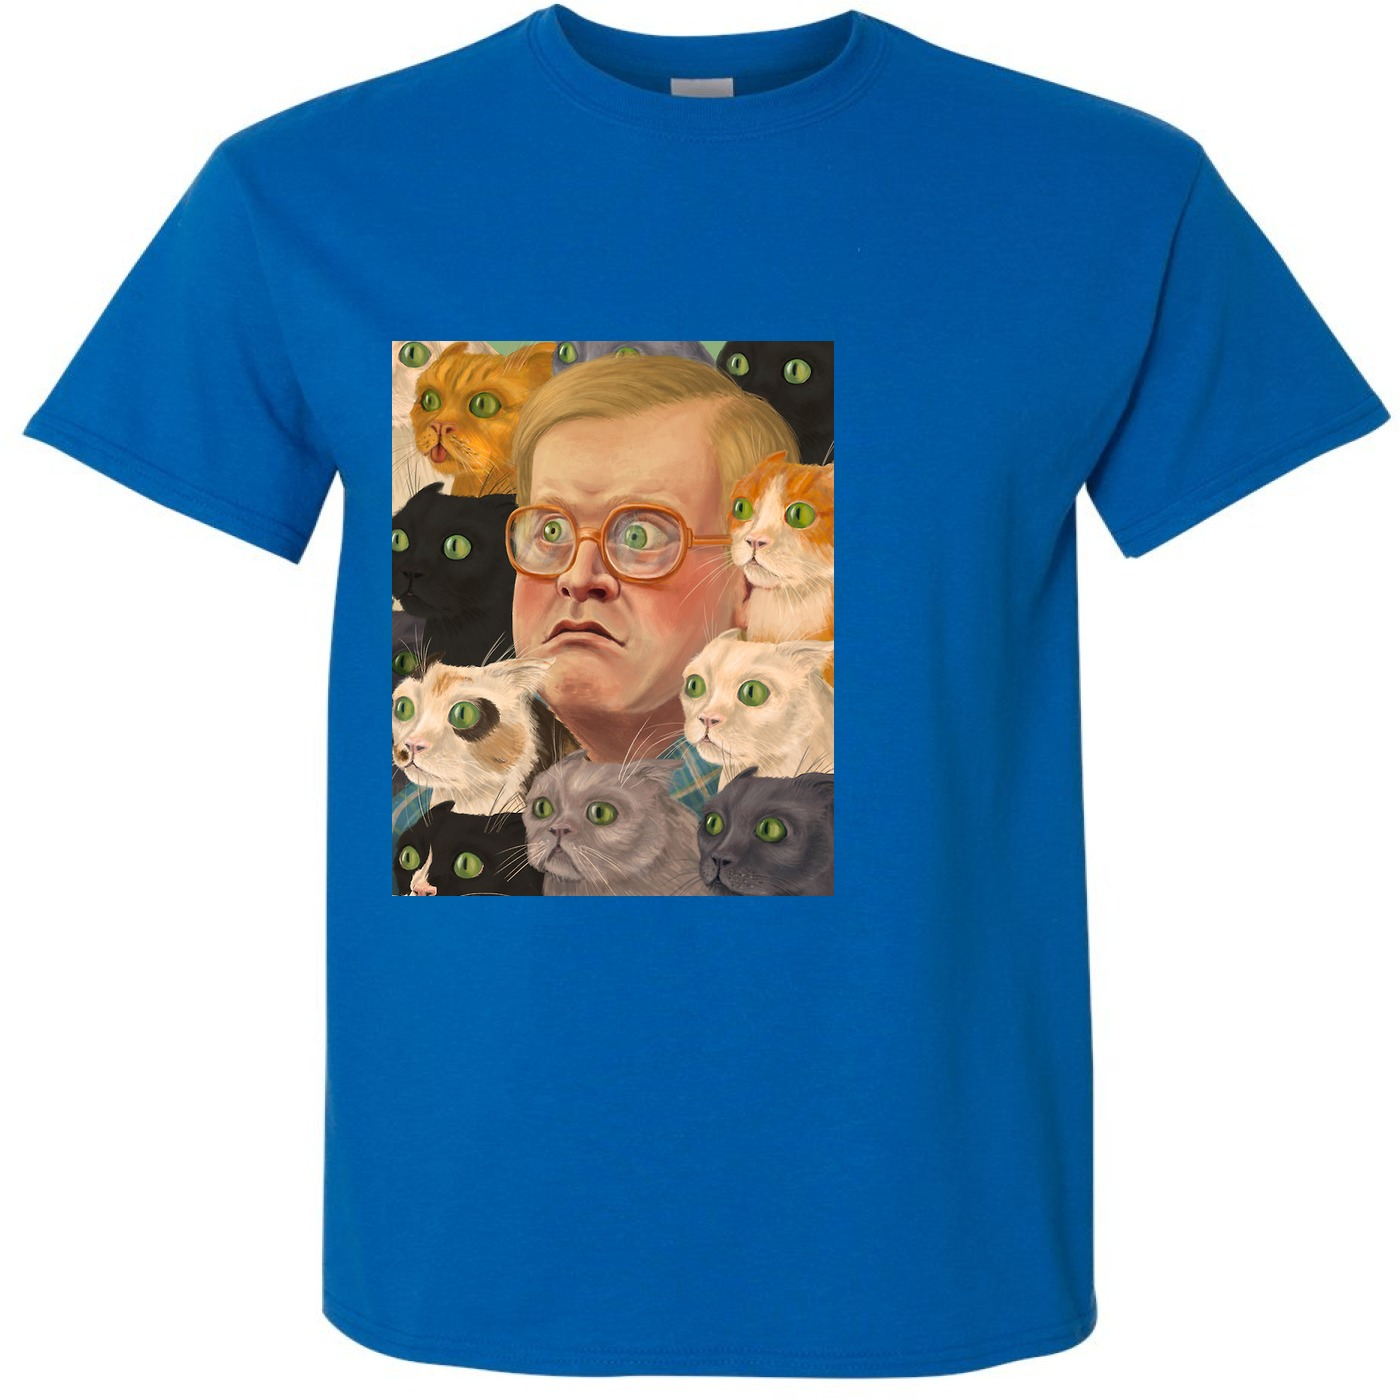 Cool New Shirt